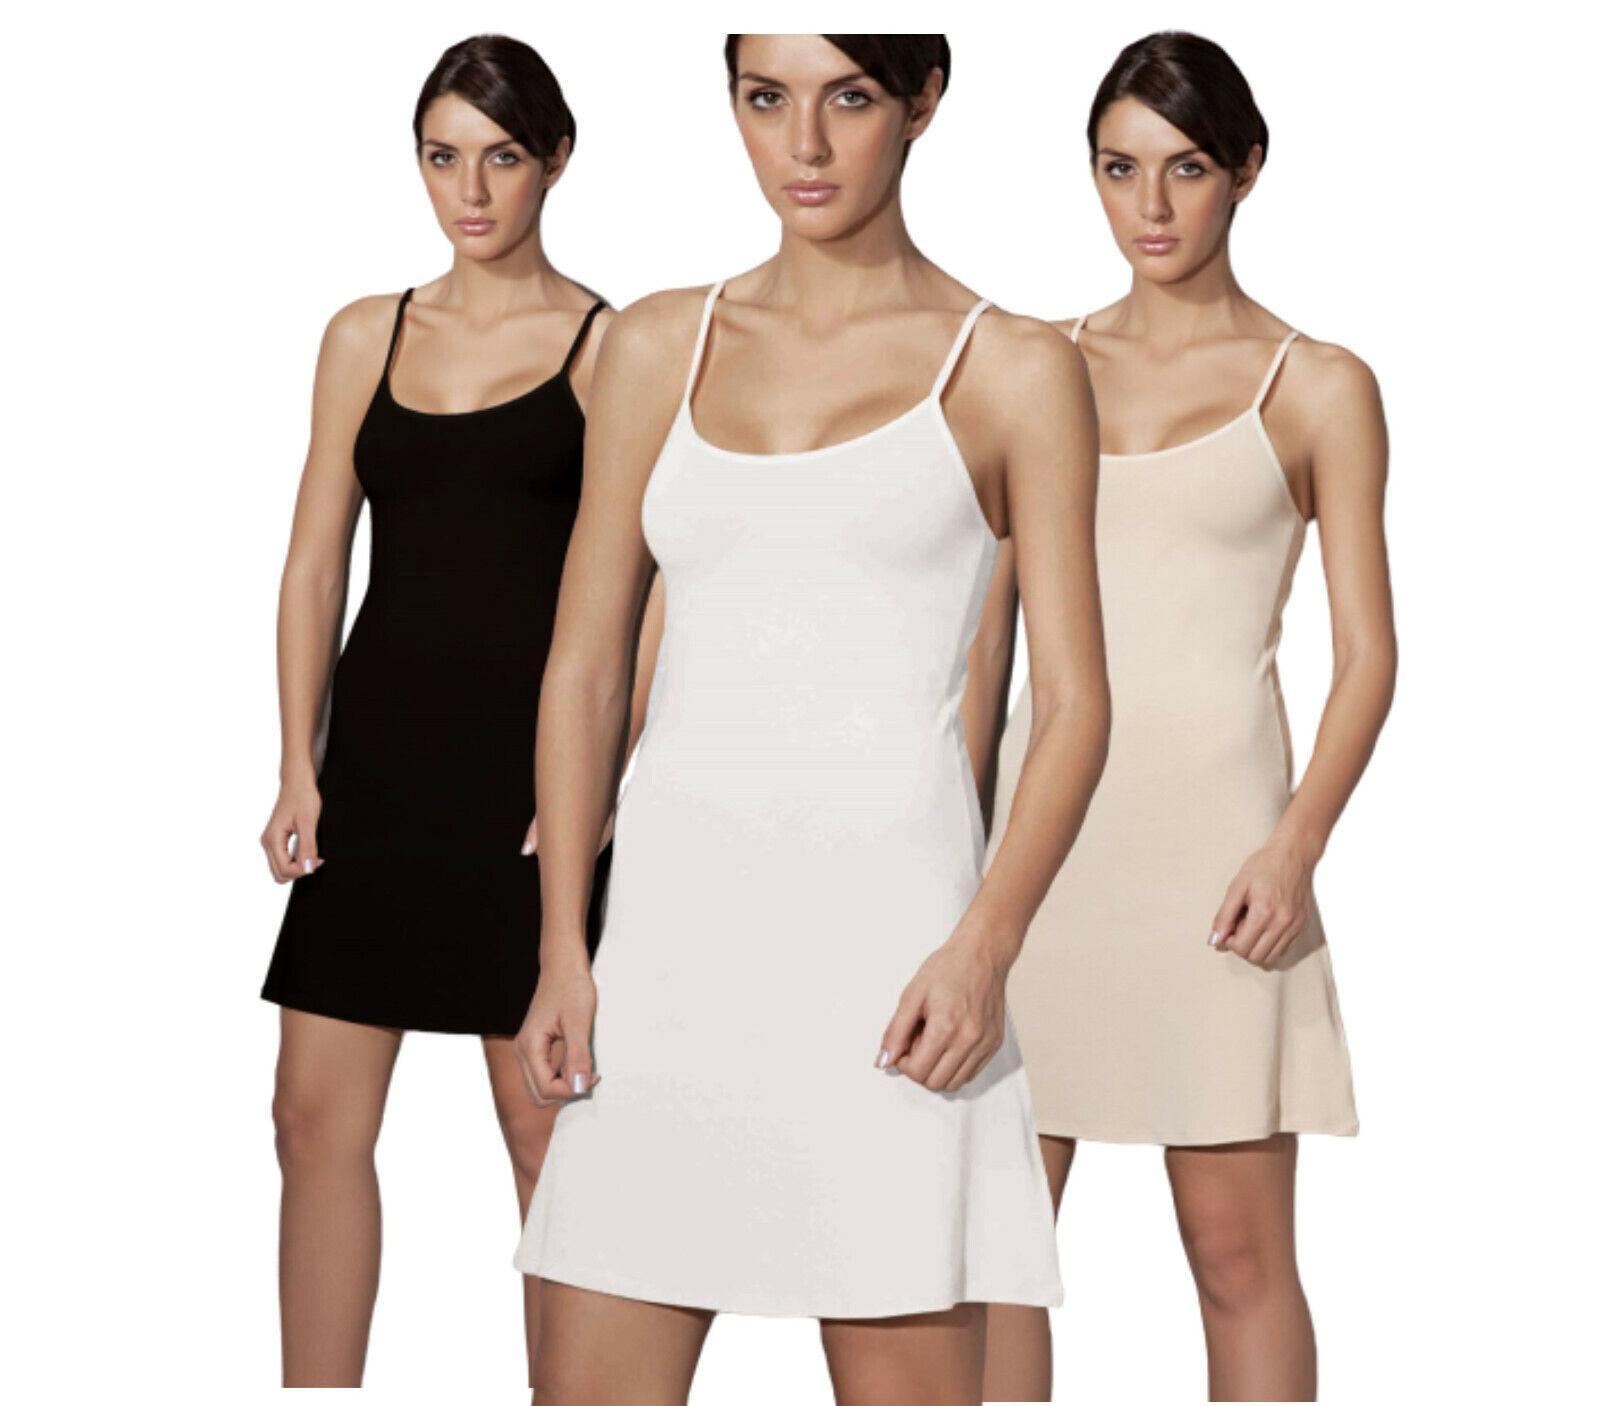 Doreanse Damen Unterkleid verstellbare Träger Mini Nachtkleid Modal D11128